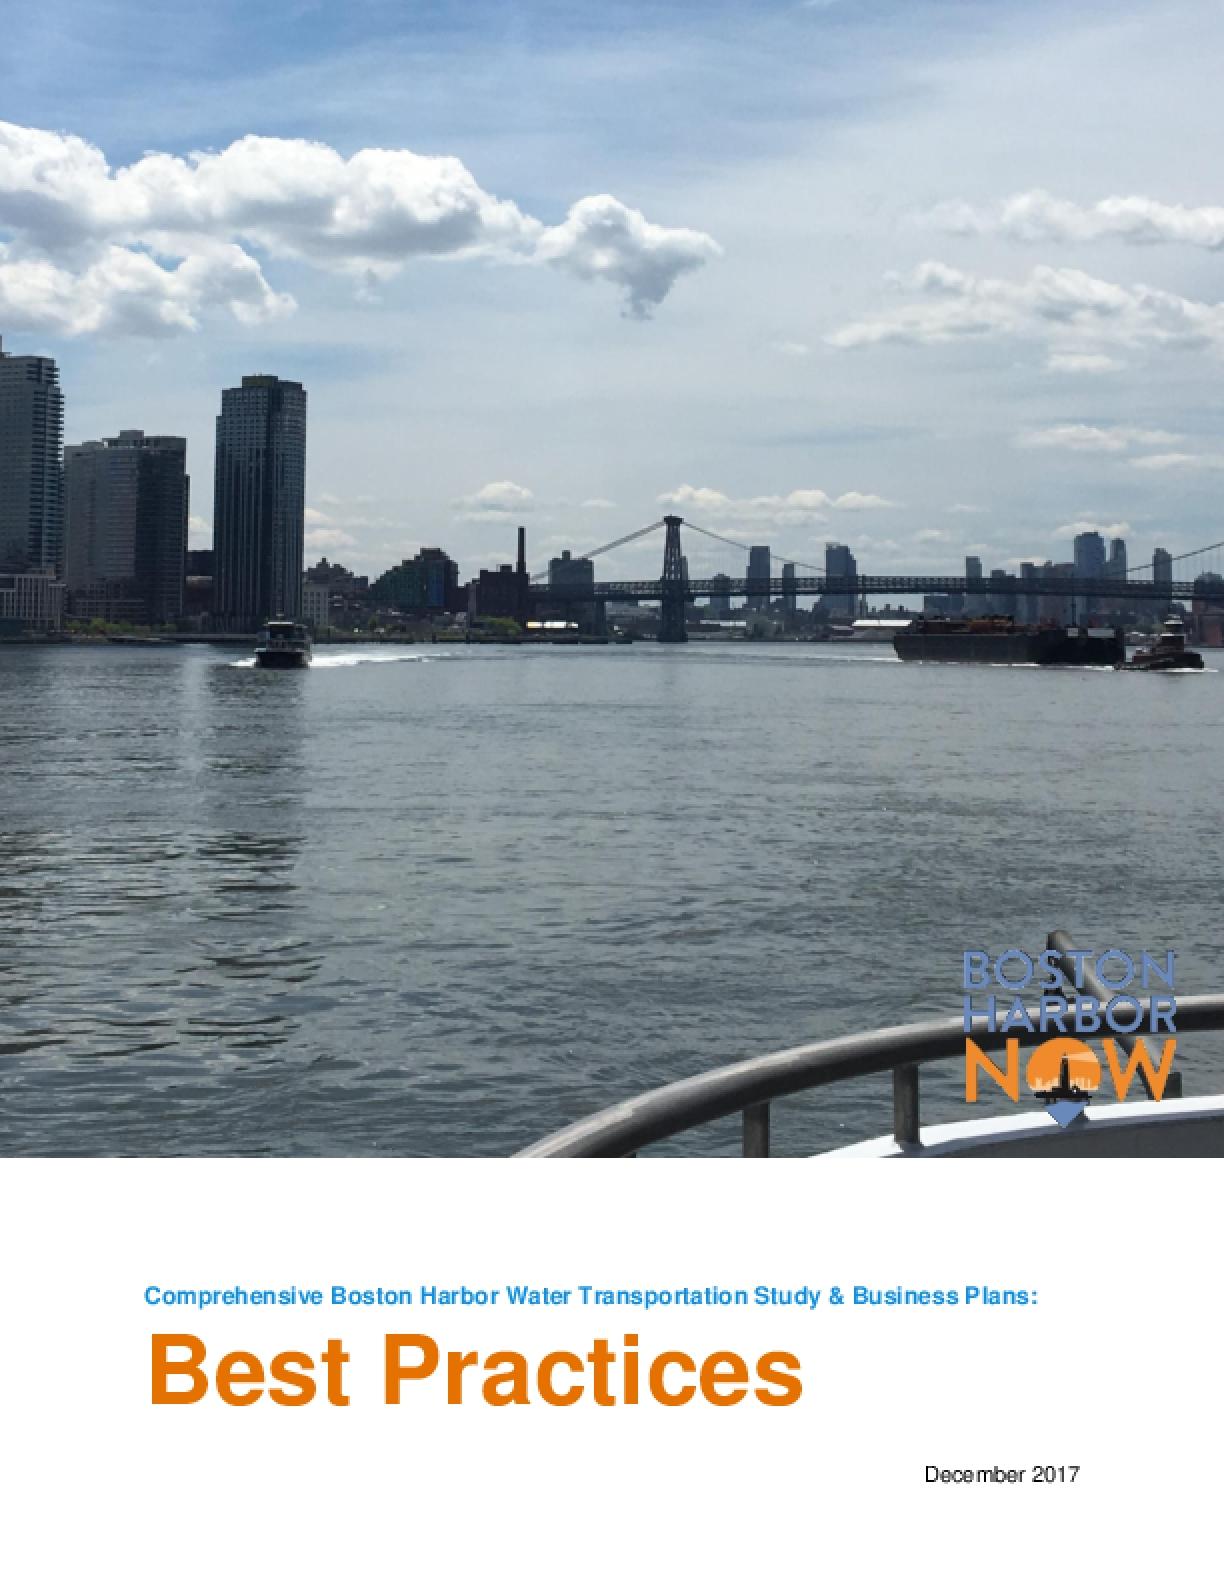 Comprehensive Boston Harbor Water Transportation Study & Business Plan: Best Practices